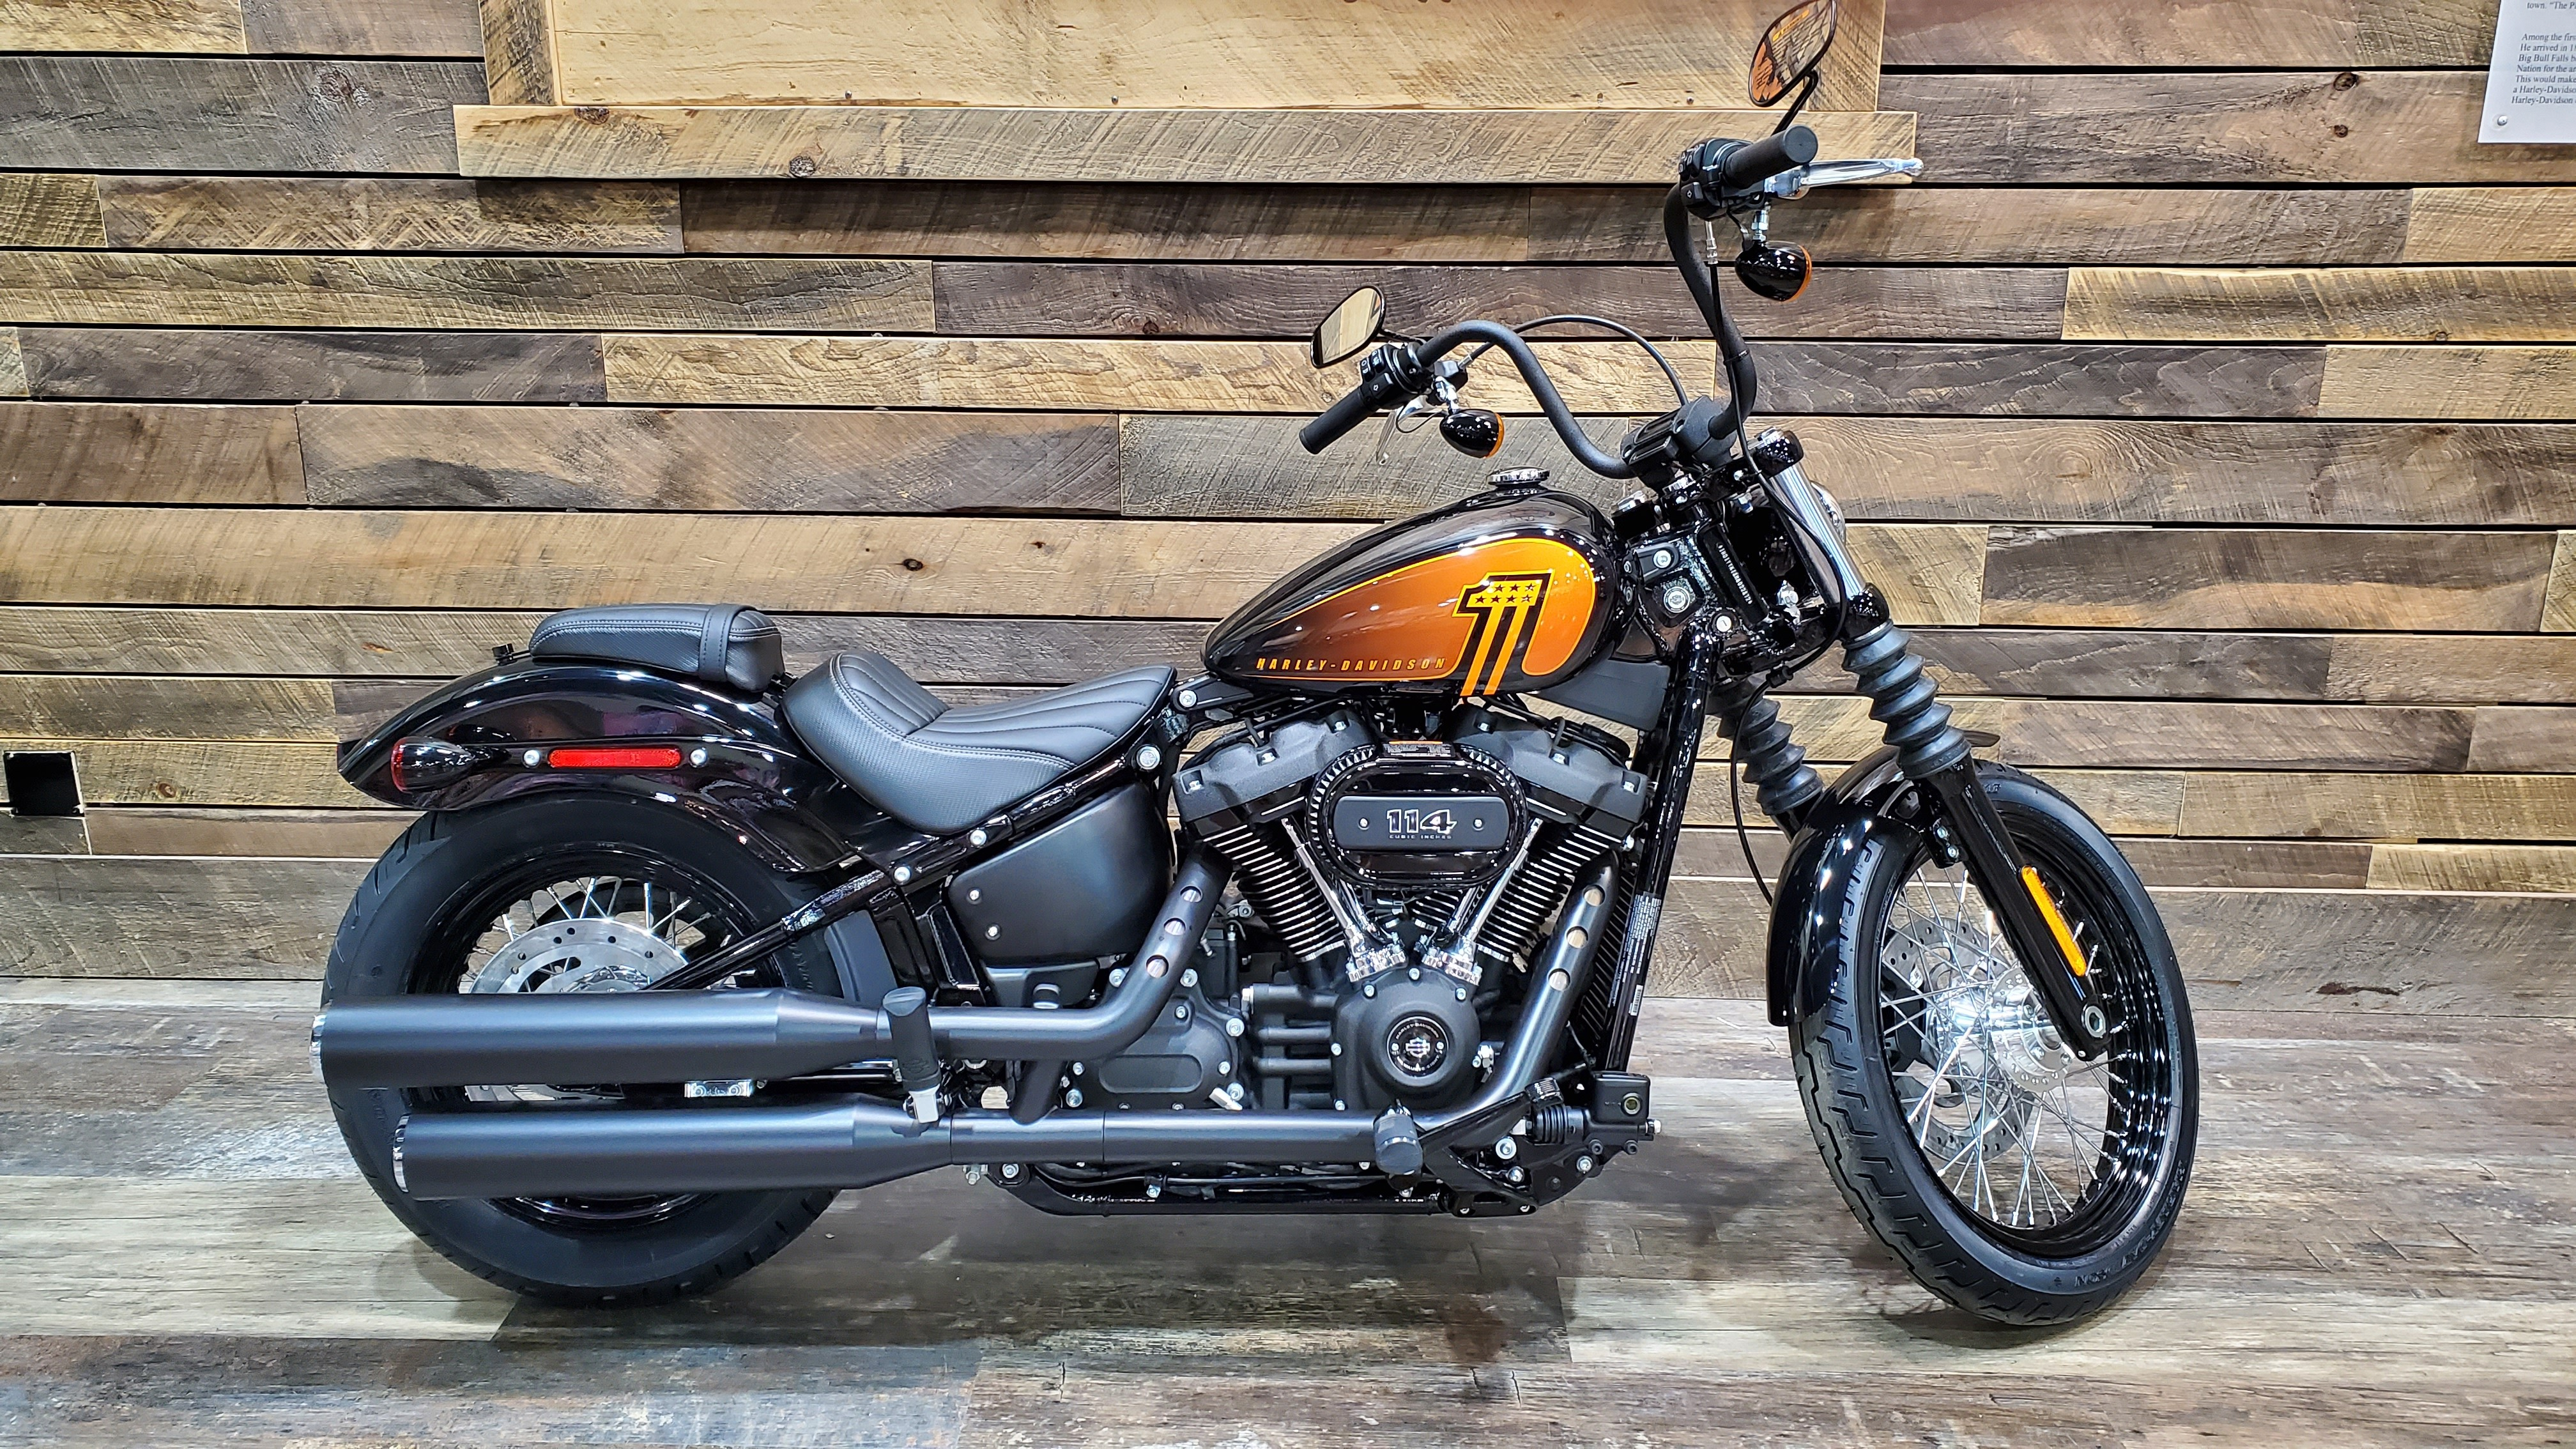 2021 Harley-Davidson Cruiser FXBBS Street Bob 114 at Bull Falls Harley-Davidson